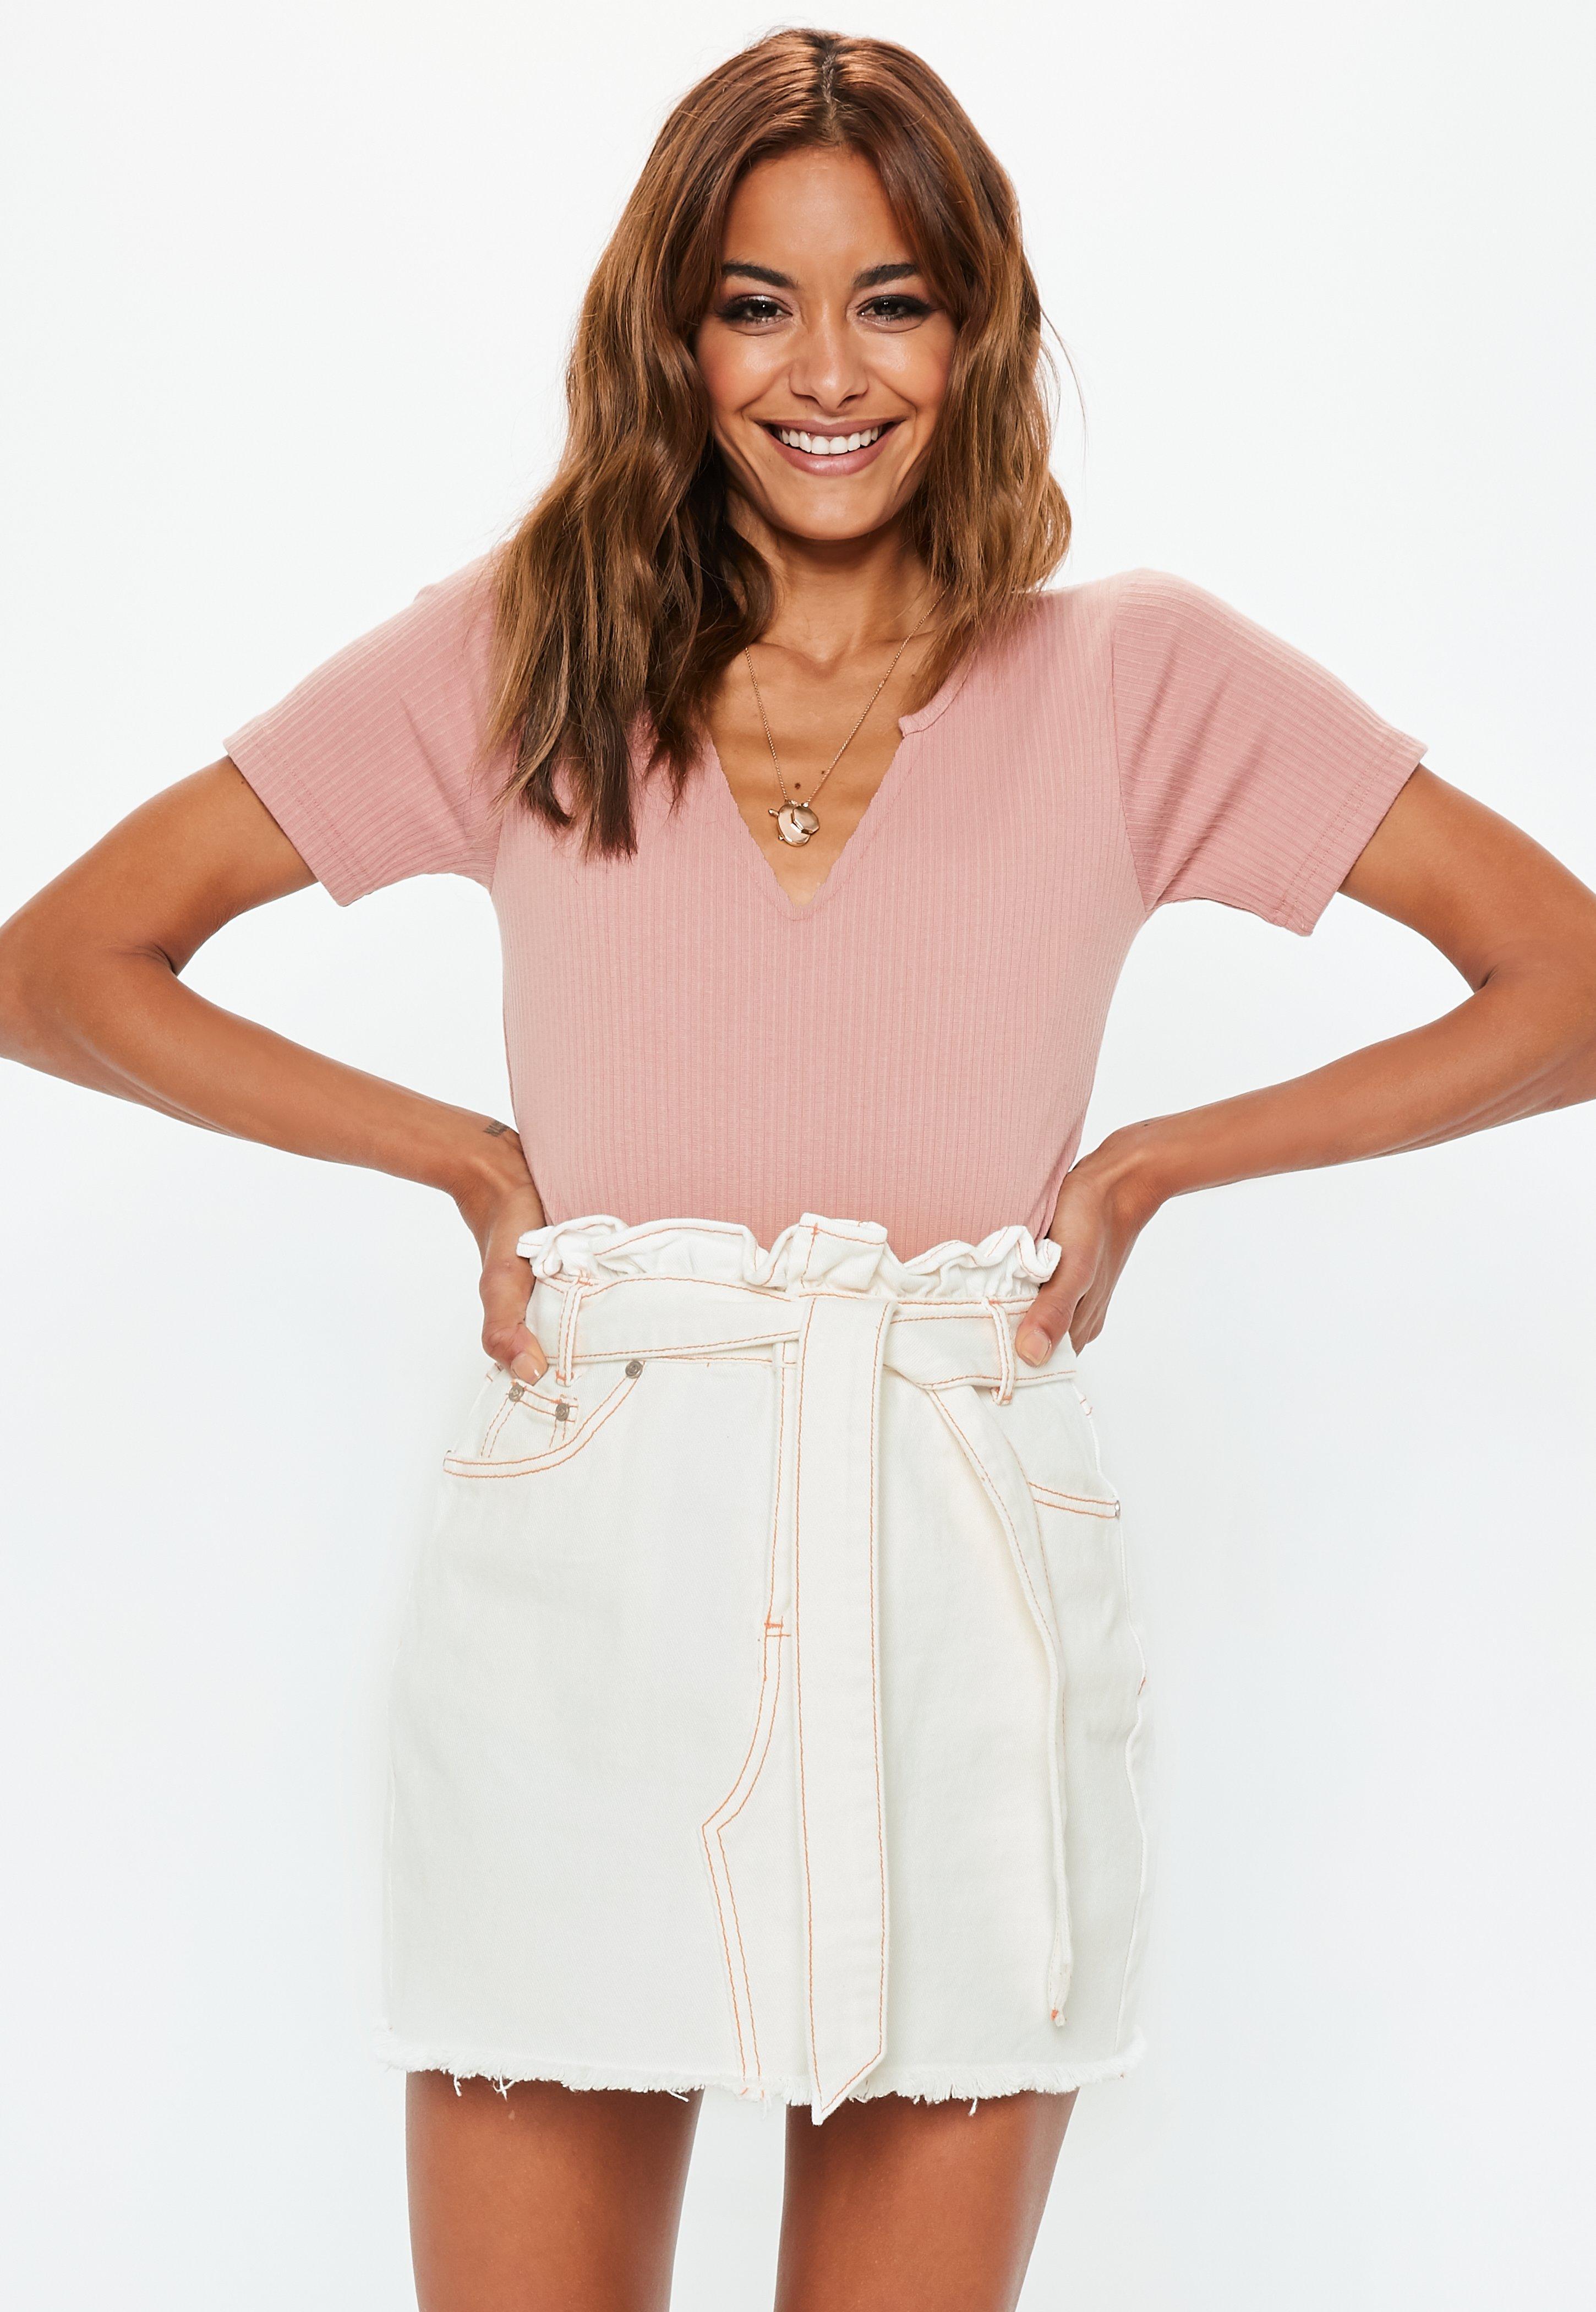 b3e196ade Lyst - Missguided White Contrast Stitch Paperbag Denim Mini Skirt in ...